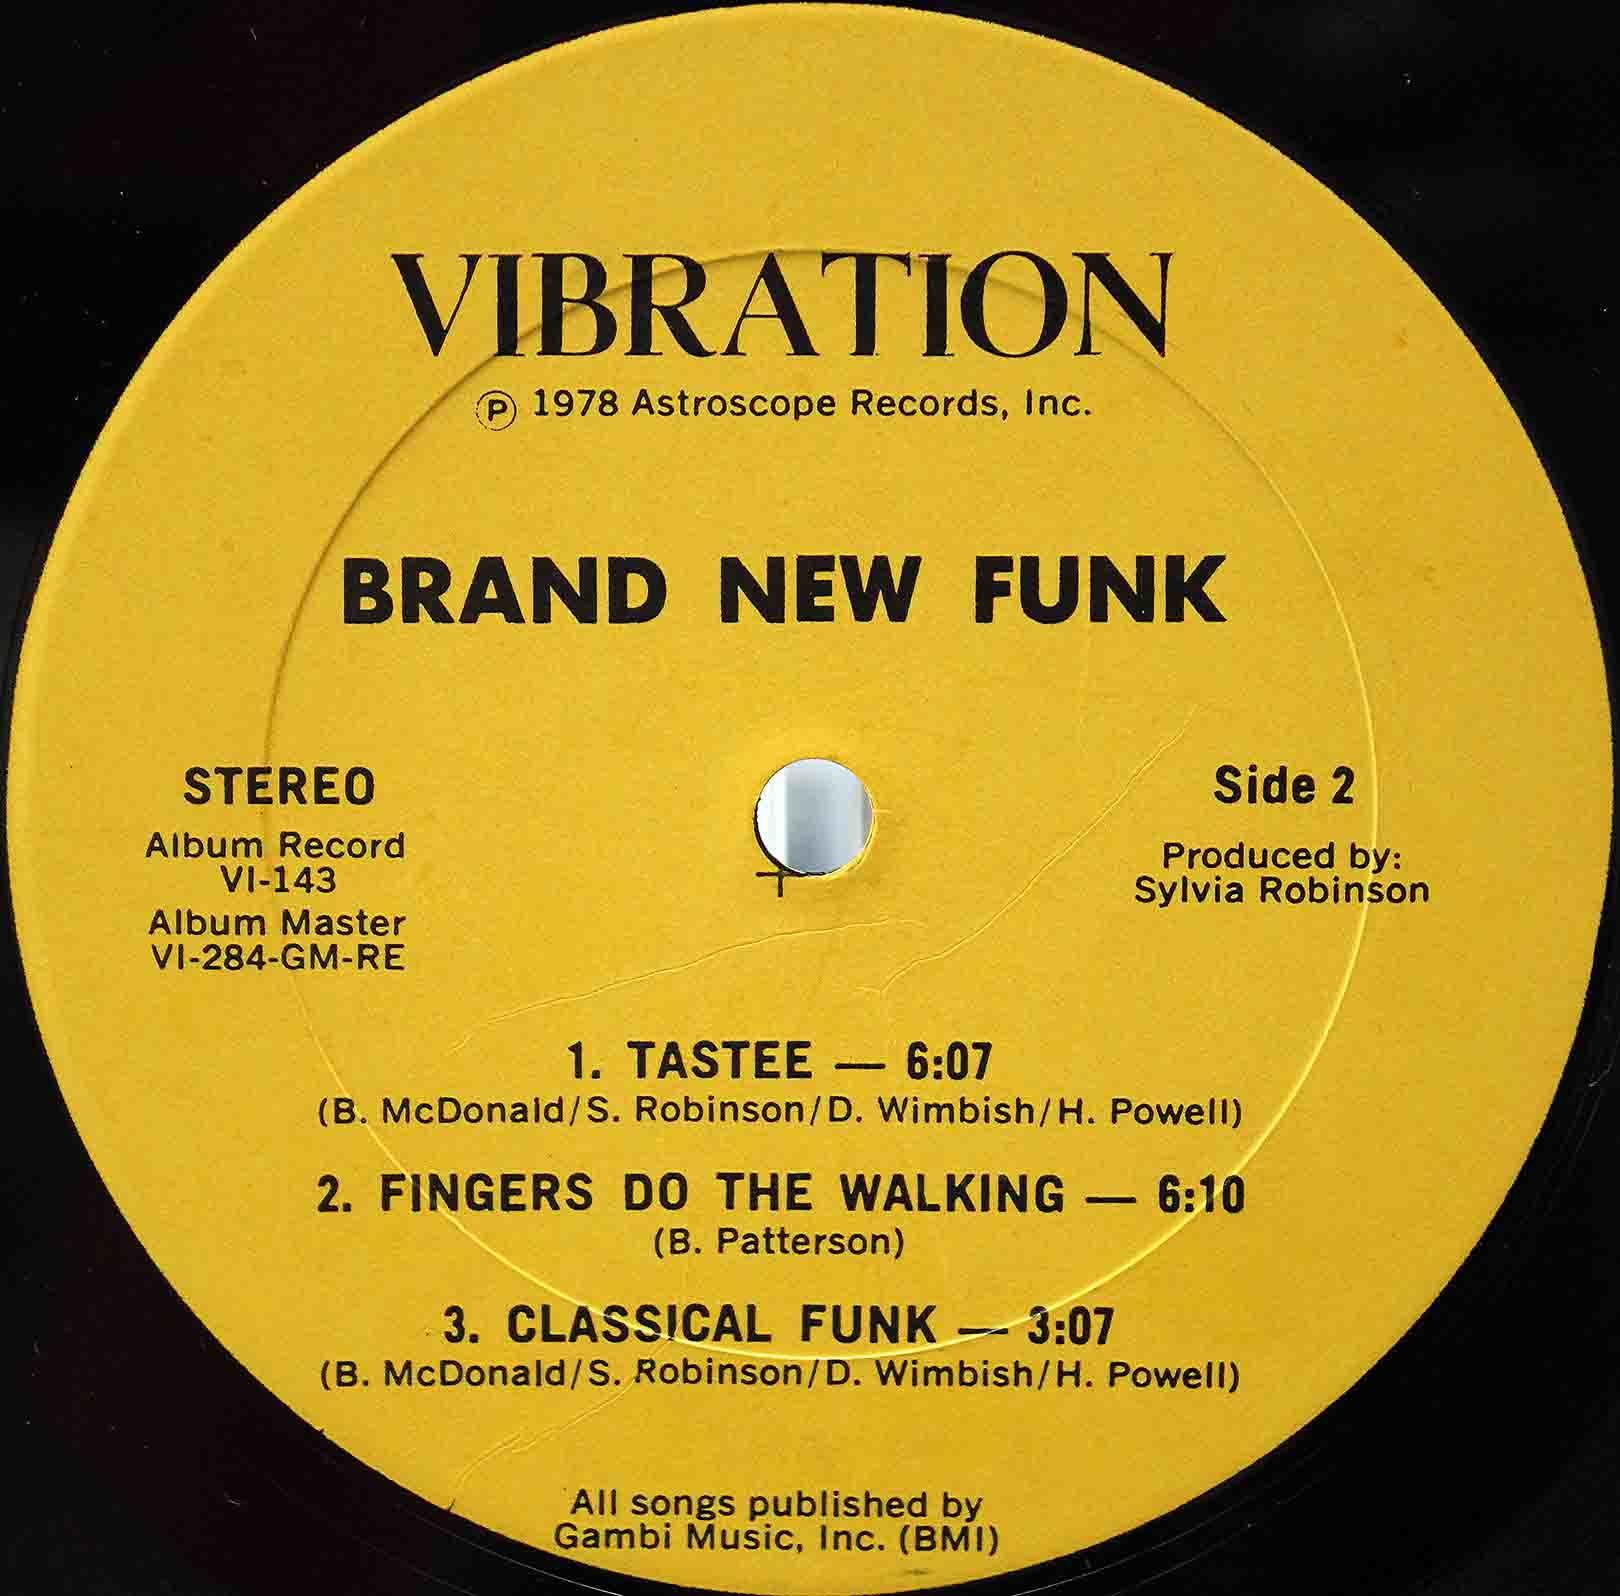 Brand New Funk 78 04